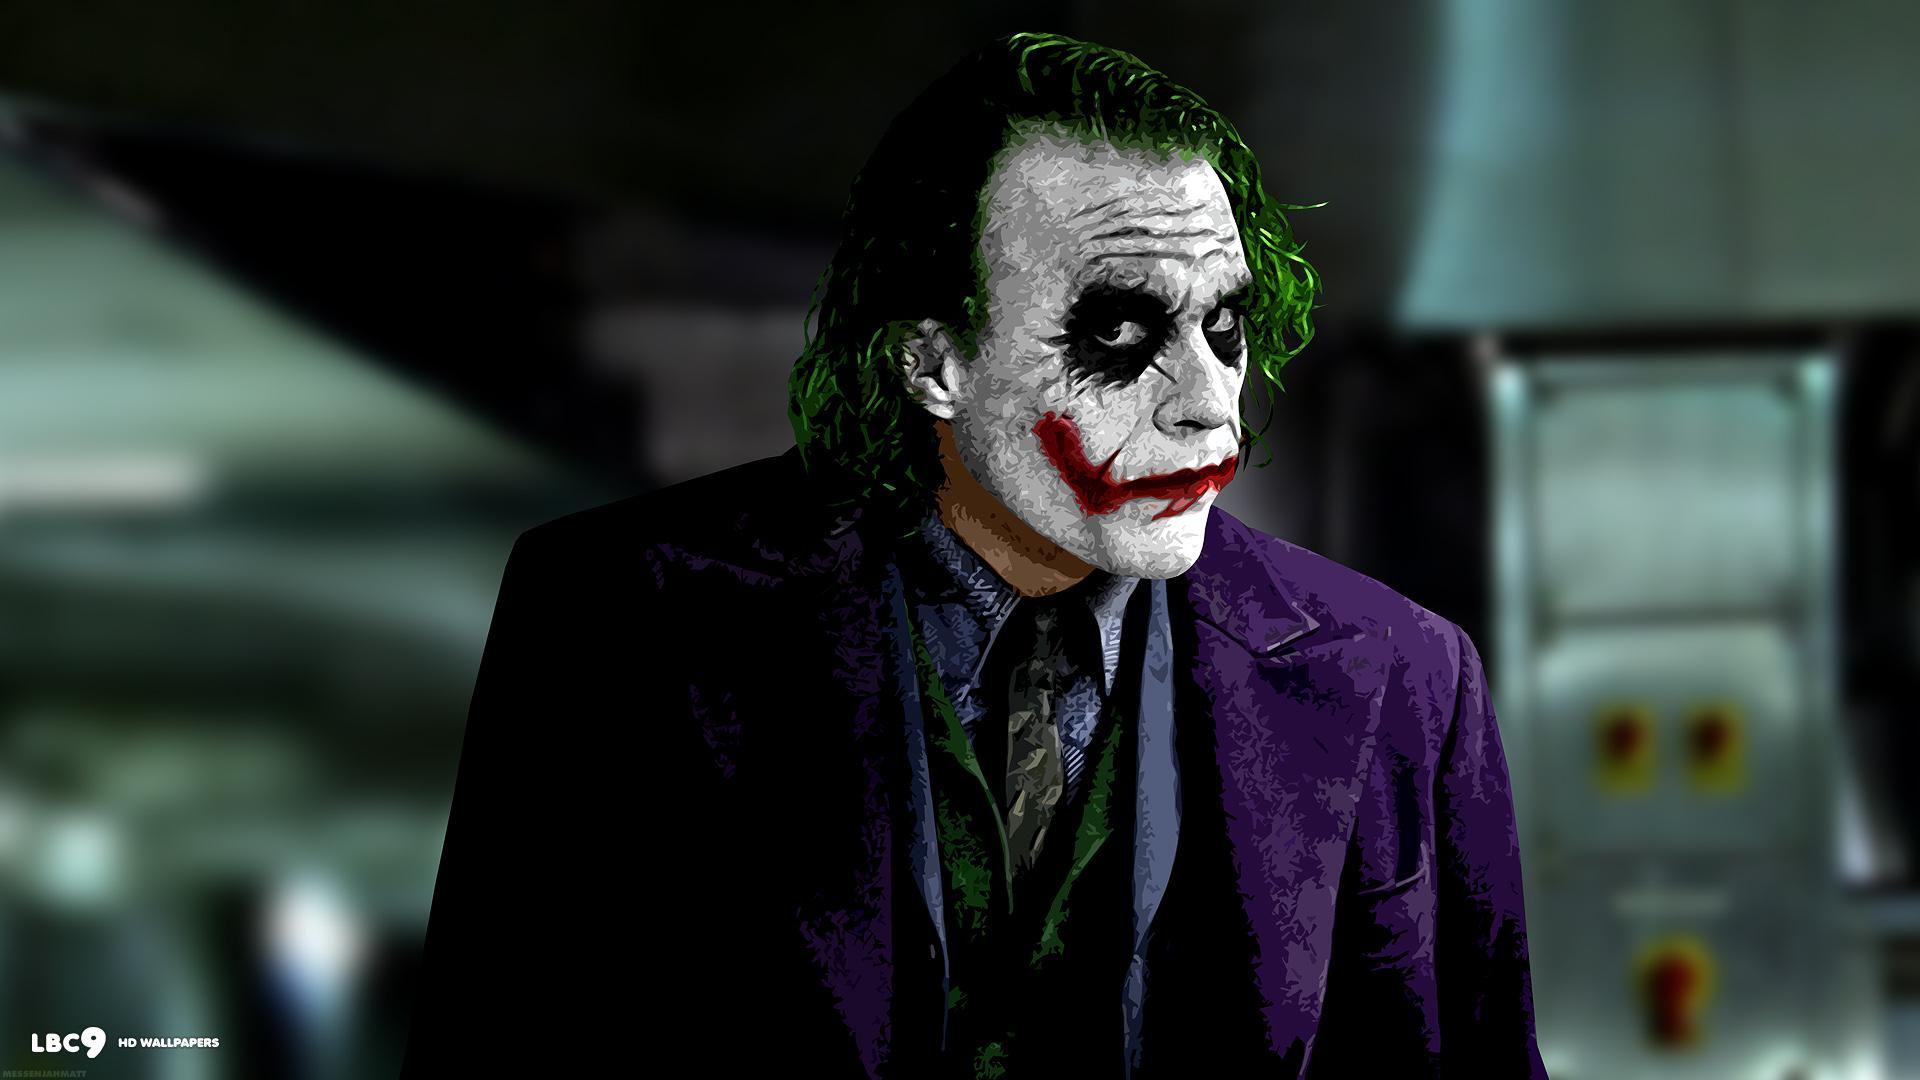 The Joker The Dark Knight Wallpaper HD Wallpapers Desktop